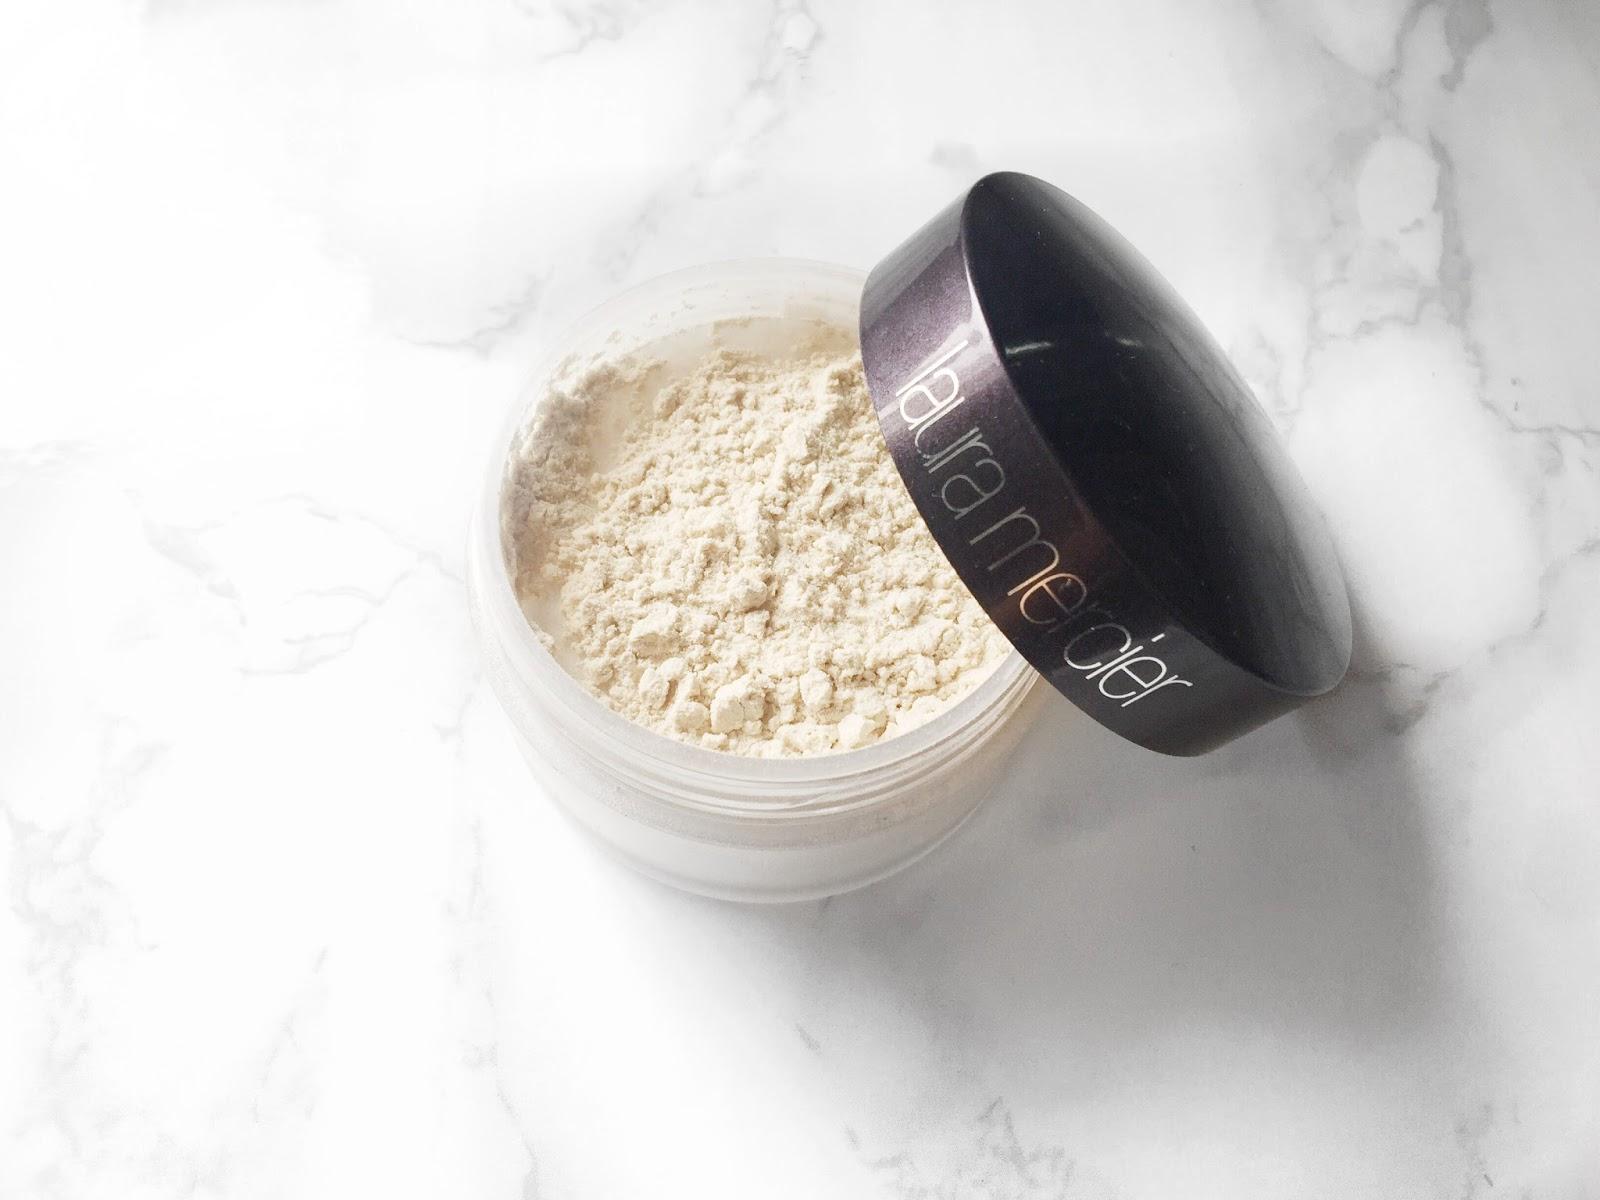 Laura Mercier Translucent Powder Review